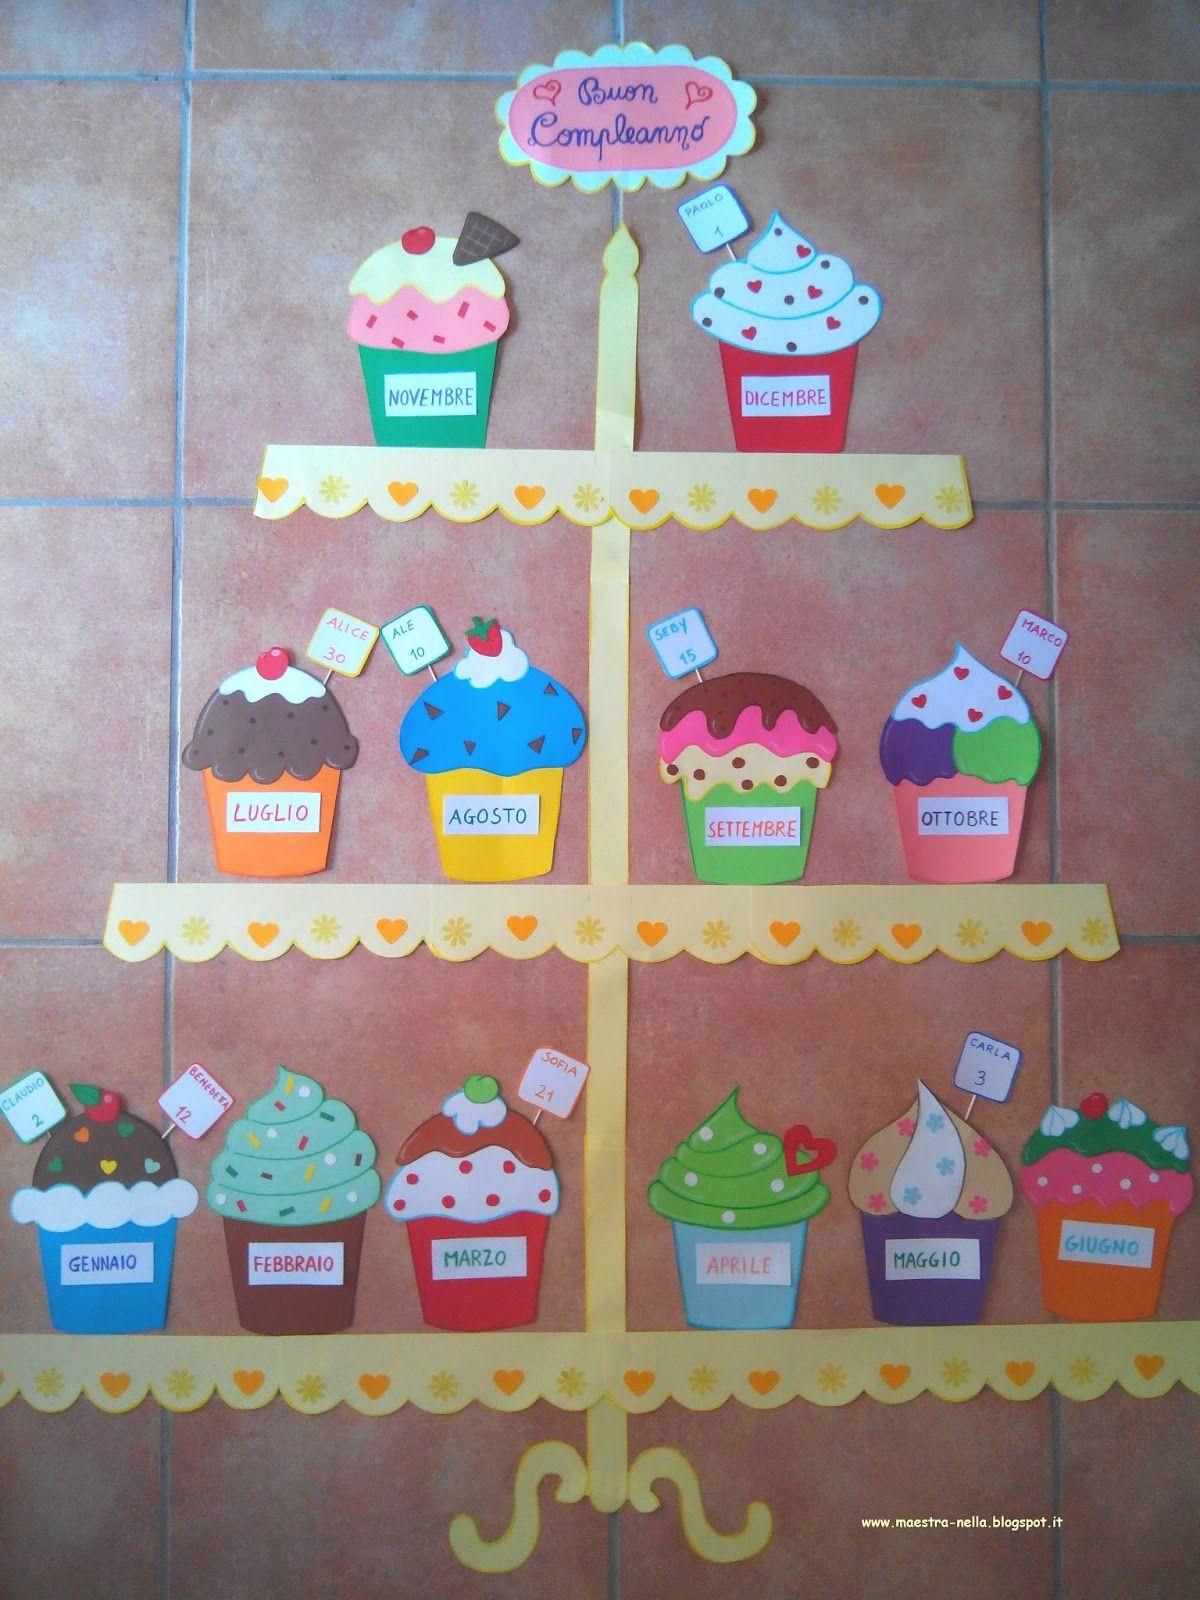 Birthday Cupcakes On A Stand | Daycare Decor | Classroom regarding Birthday Display Cupcakes